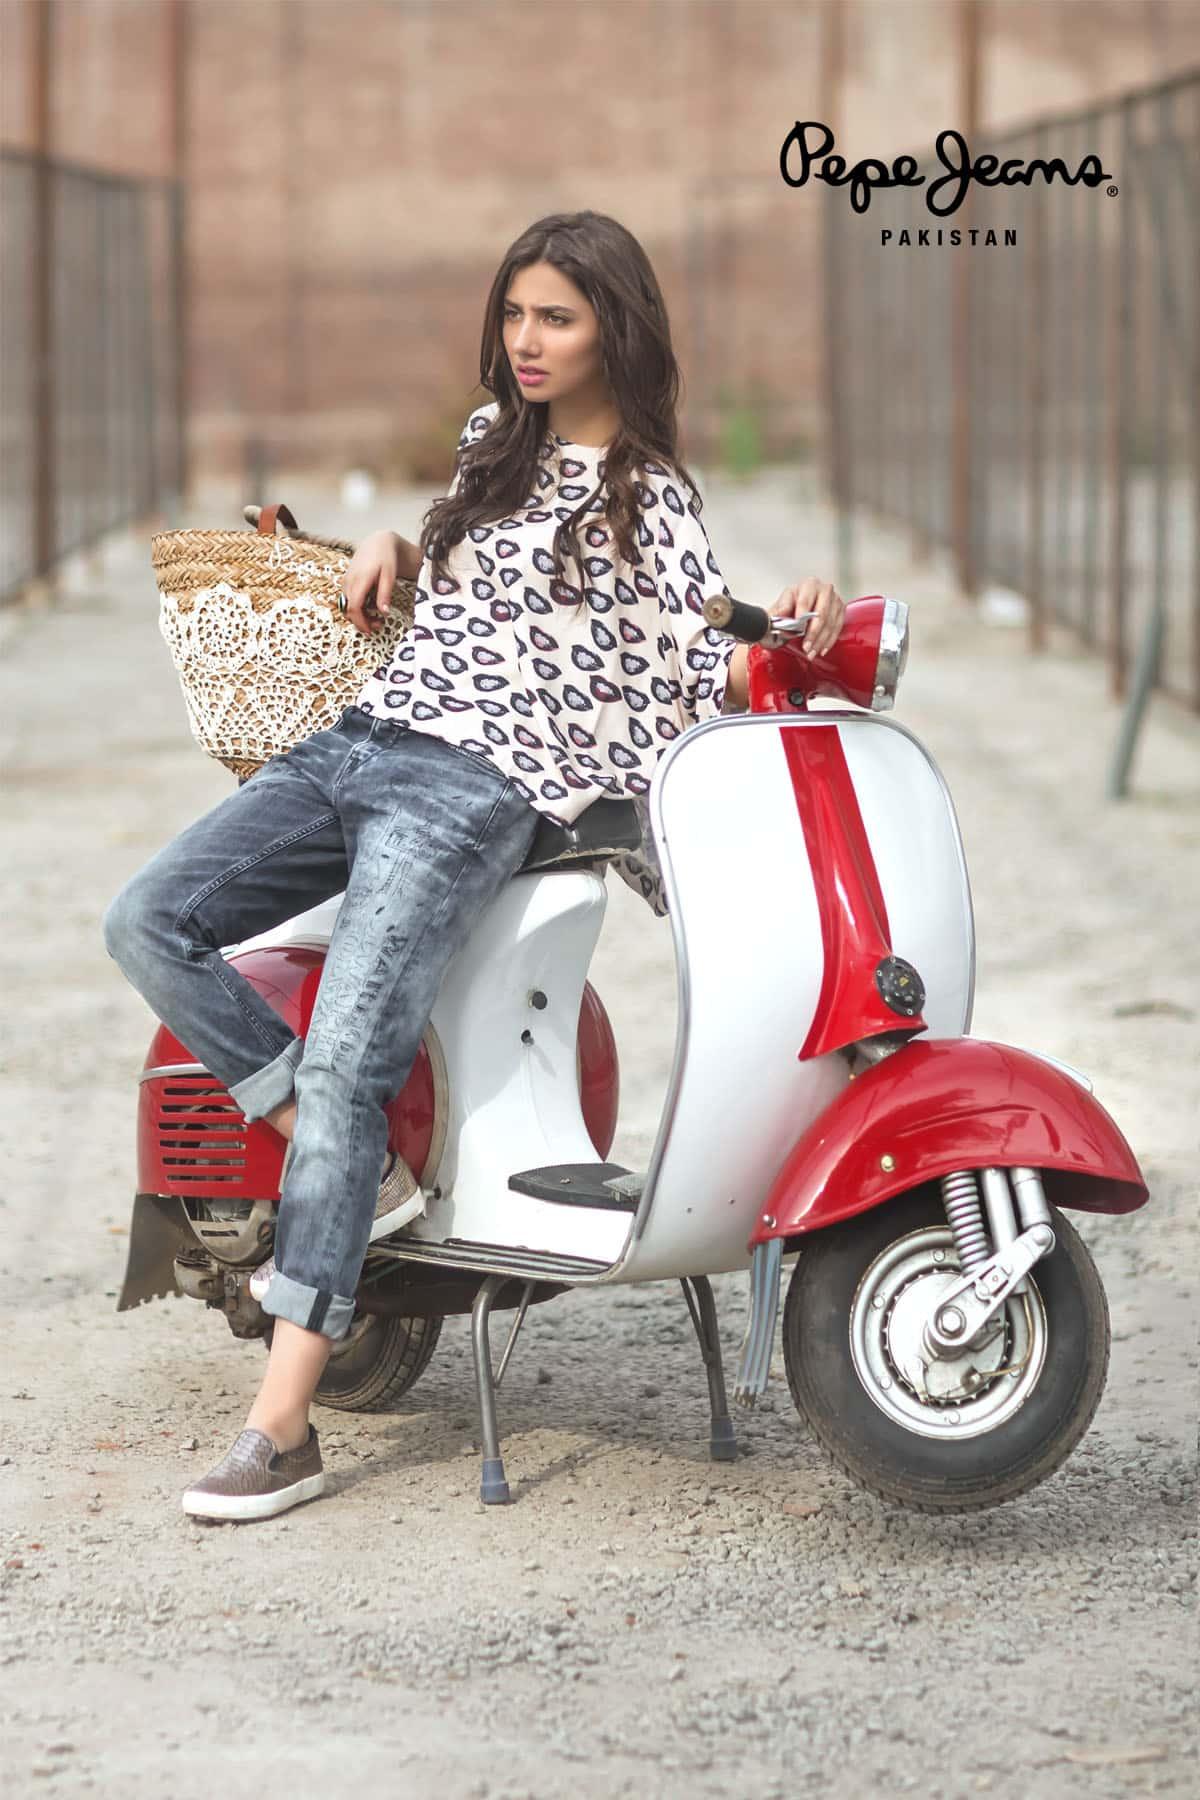 Mahira Khan for Pepe Jeans Pakistan Winter 2015 Campaign – #MKLovesPepe (9)